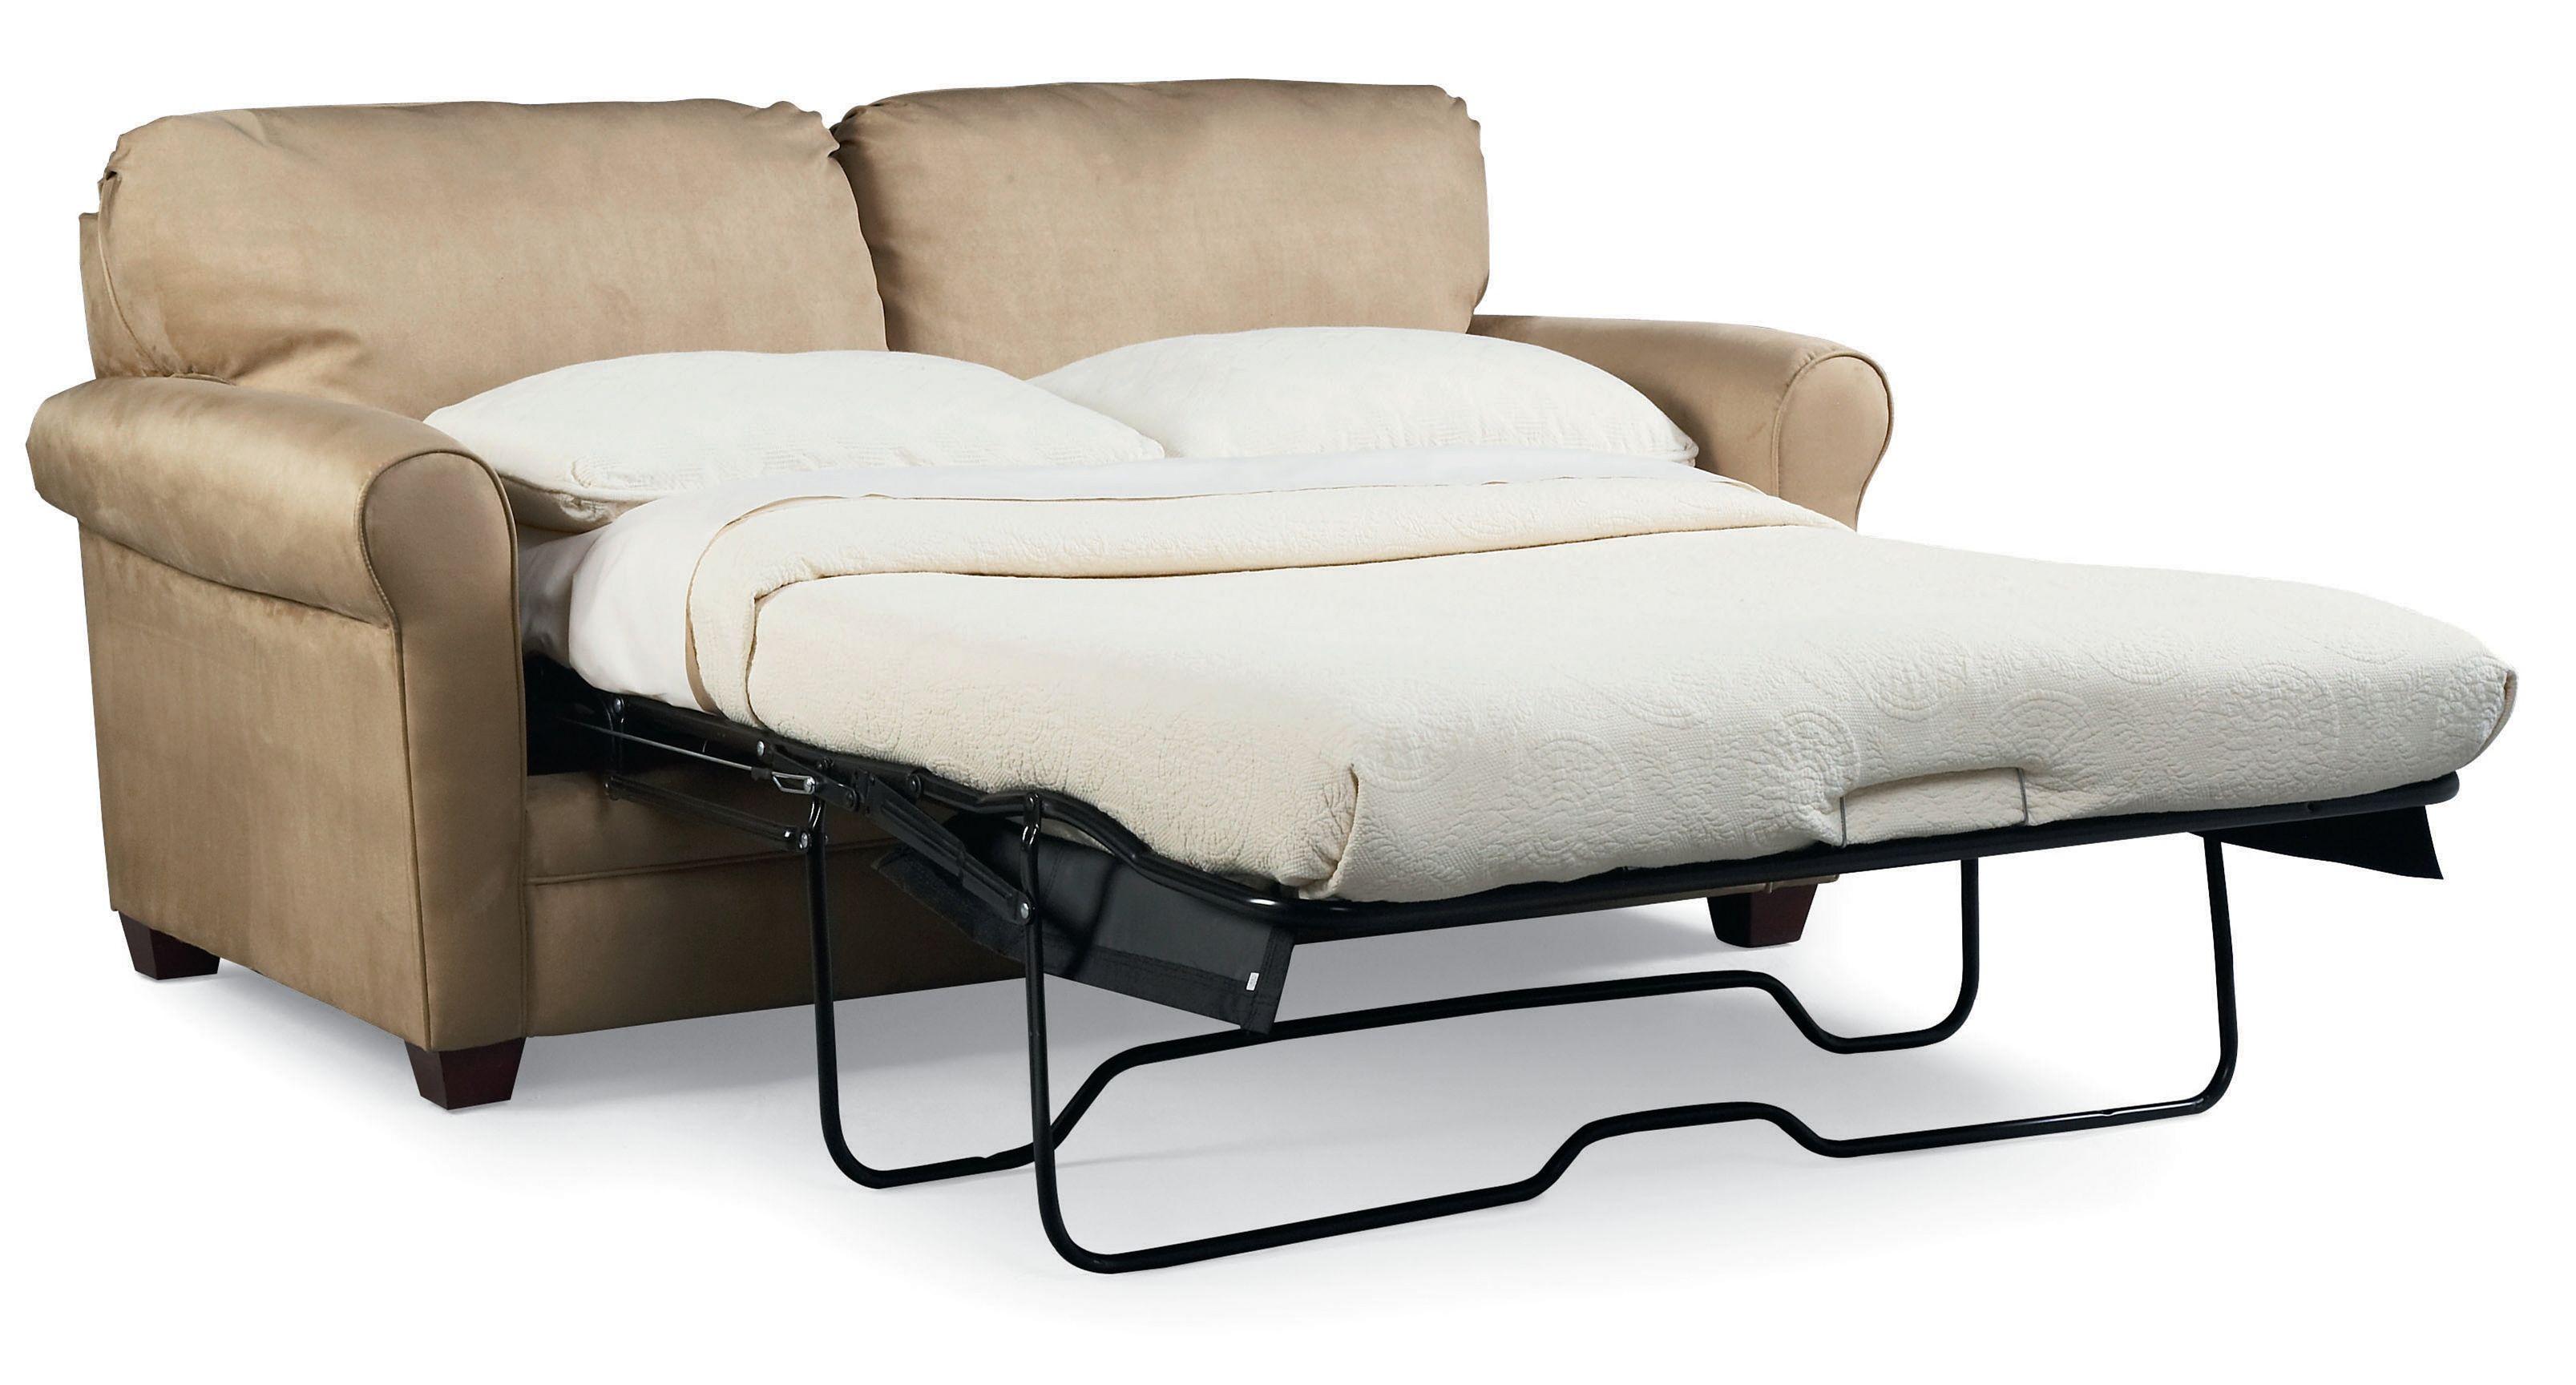 Cottage full size sleeper sofa - large sofa sleeper sofa stunning ZENOZSS